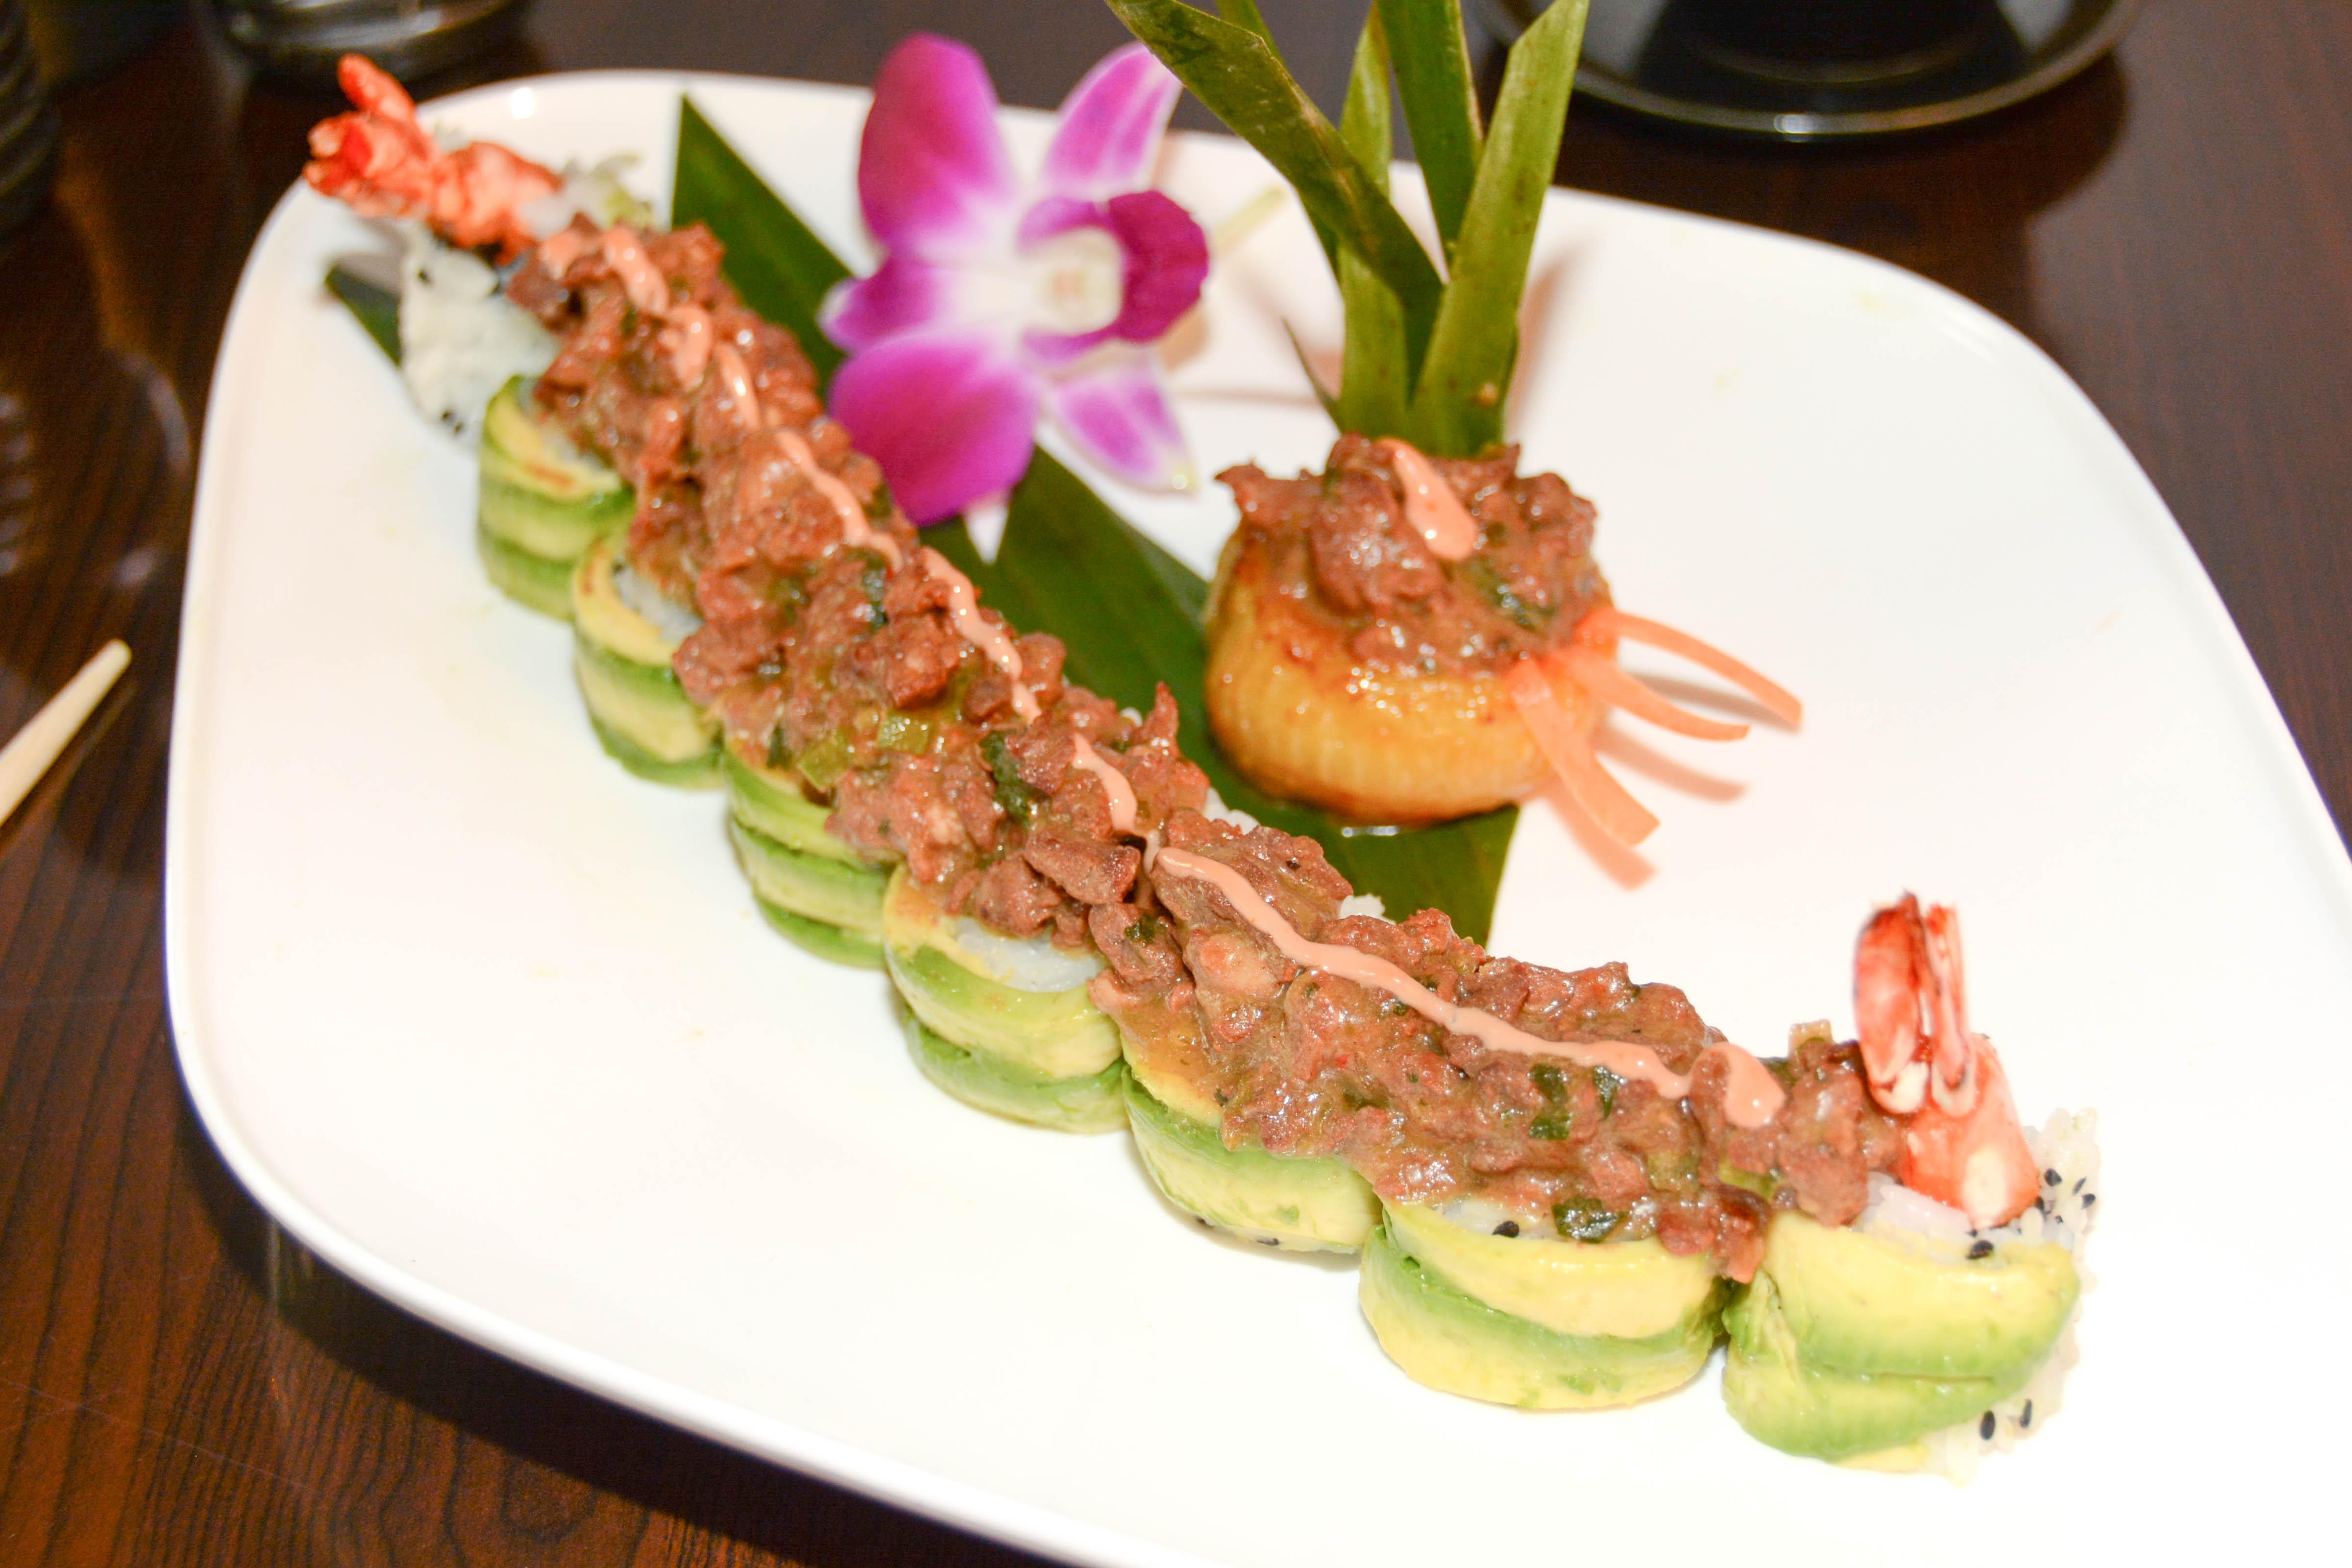 Sushi aplatanado una exquisita fusion de gastronomia for Akane japanese fusion cuisine new york ny